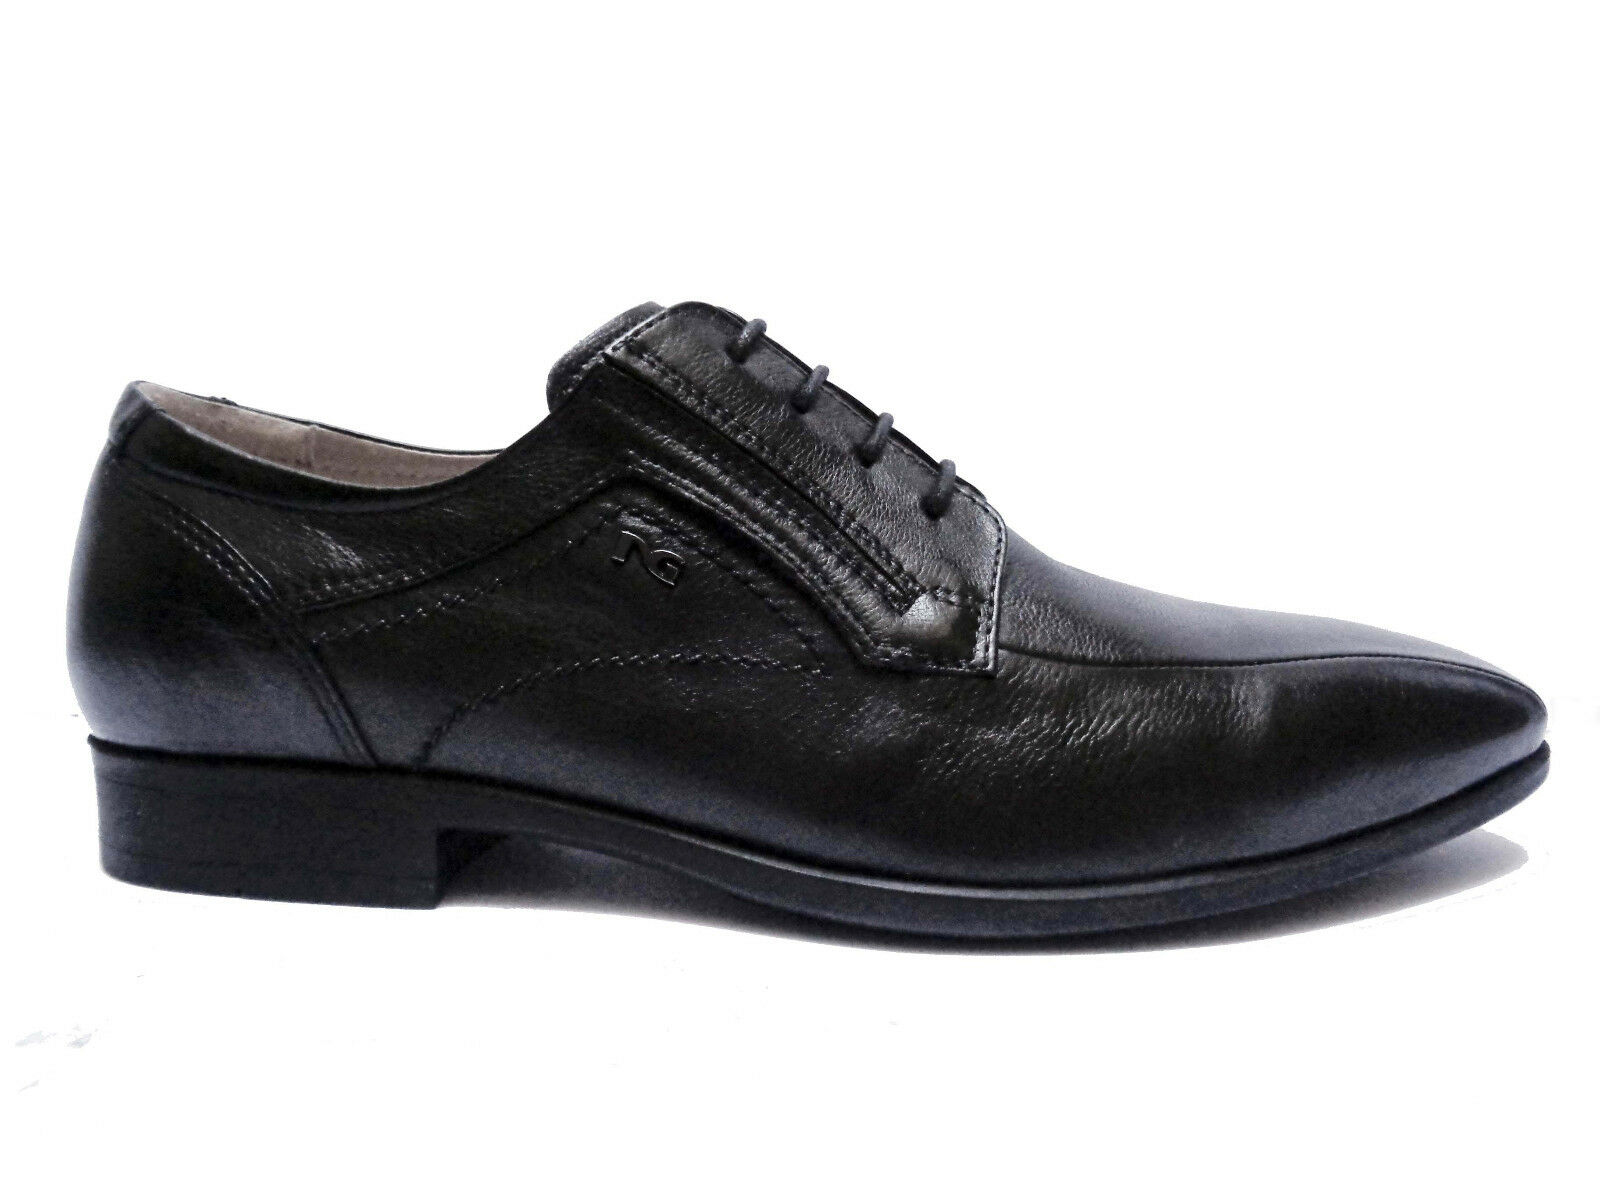 shoes men black GIARDINI 111 shoes DA men IN PELLE black FONDO GOMMA LEGGERA